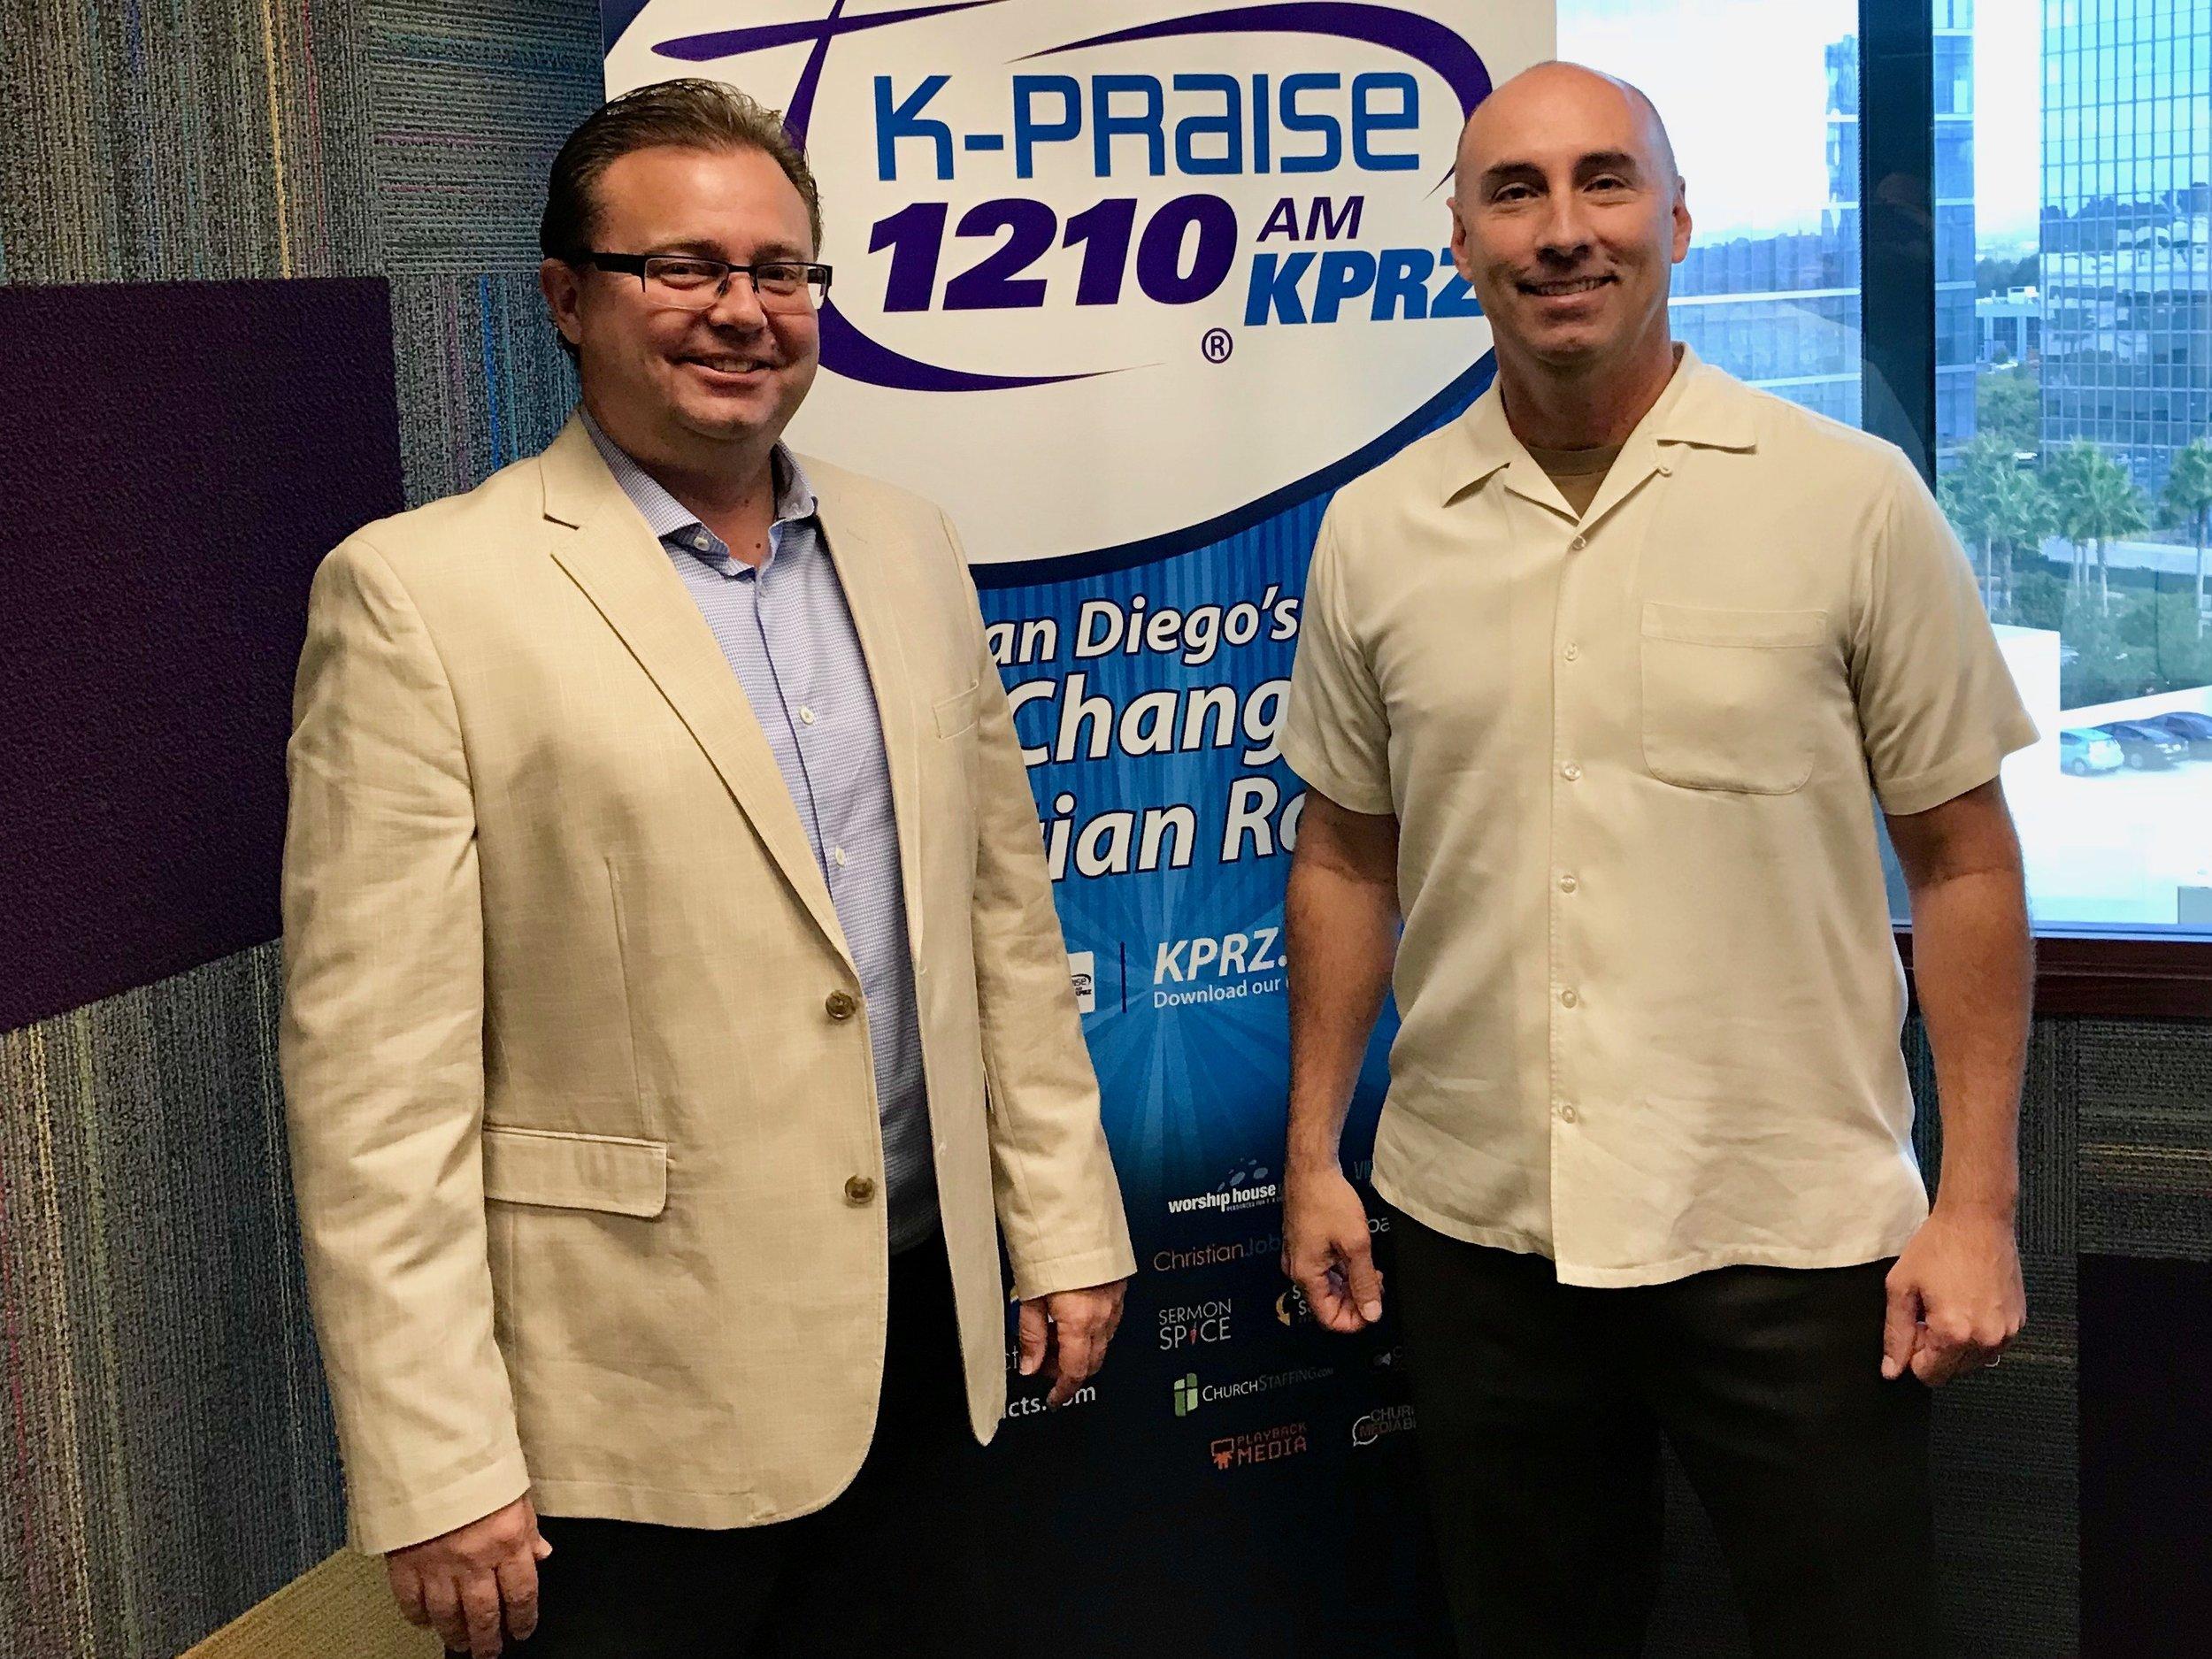 Scott Furrow and Marc Kitsko